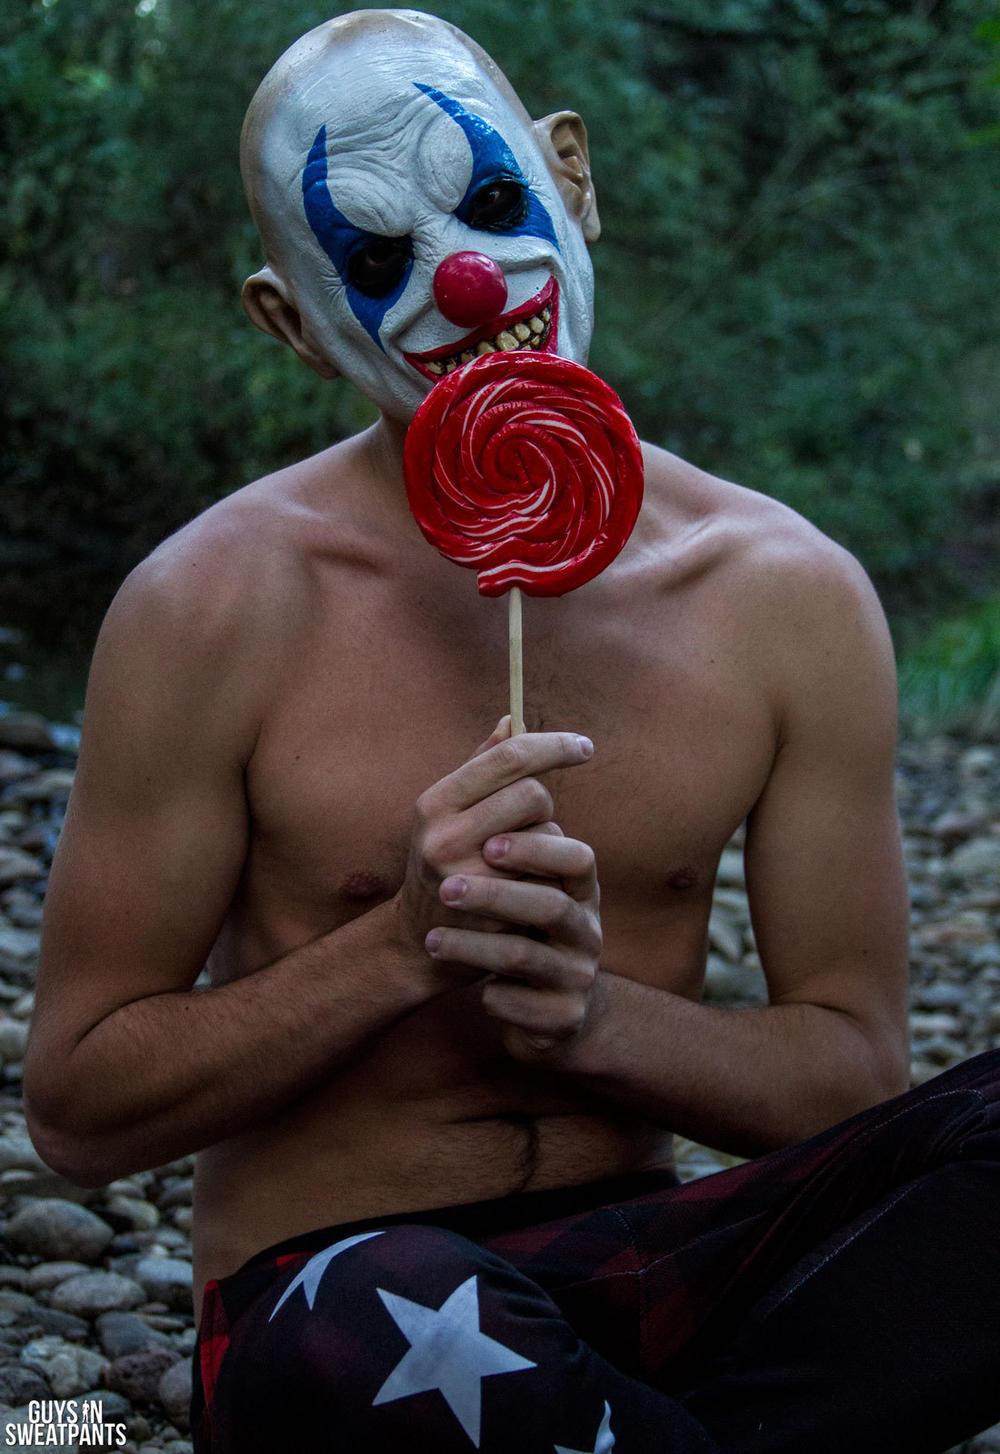 Gay Clown Porn - Guys In Sweatpants Makes Evil Clown Porn